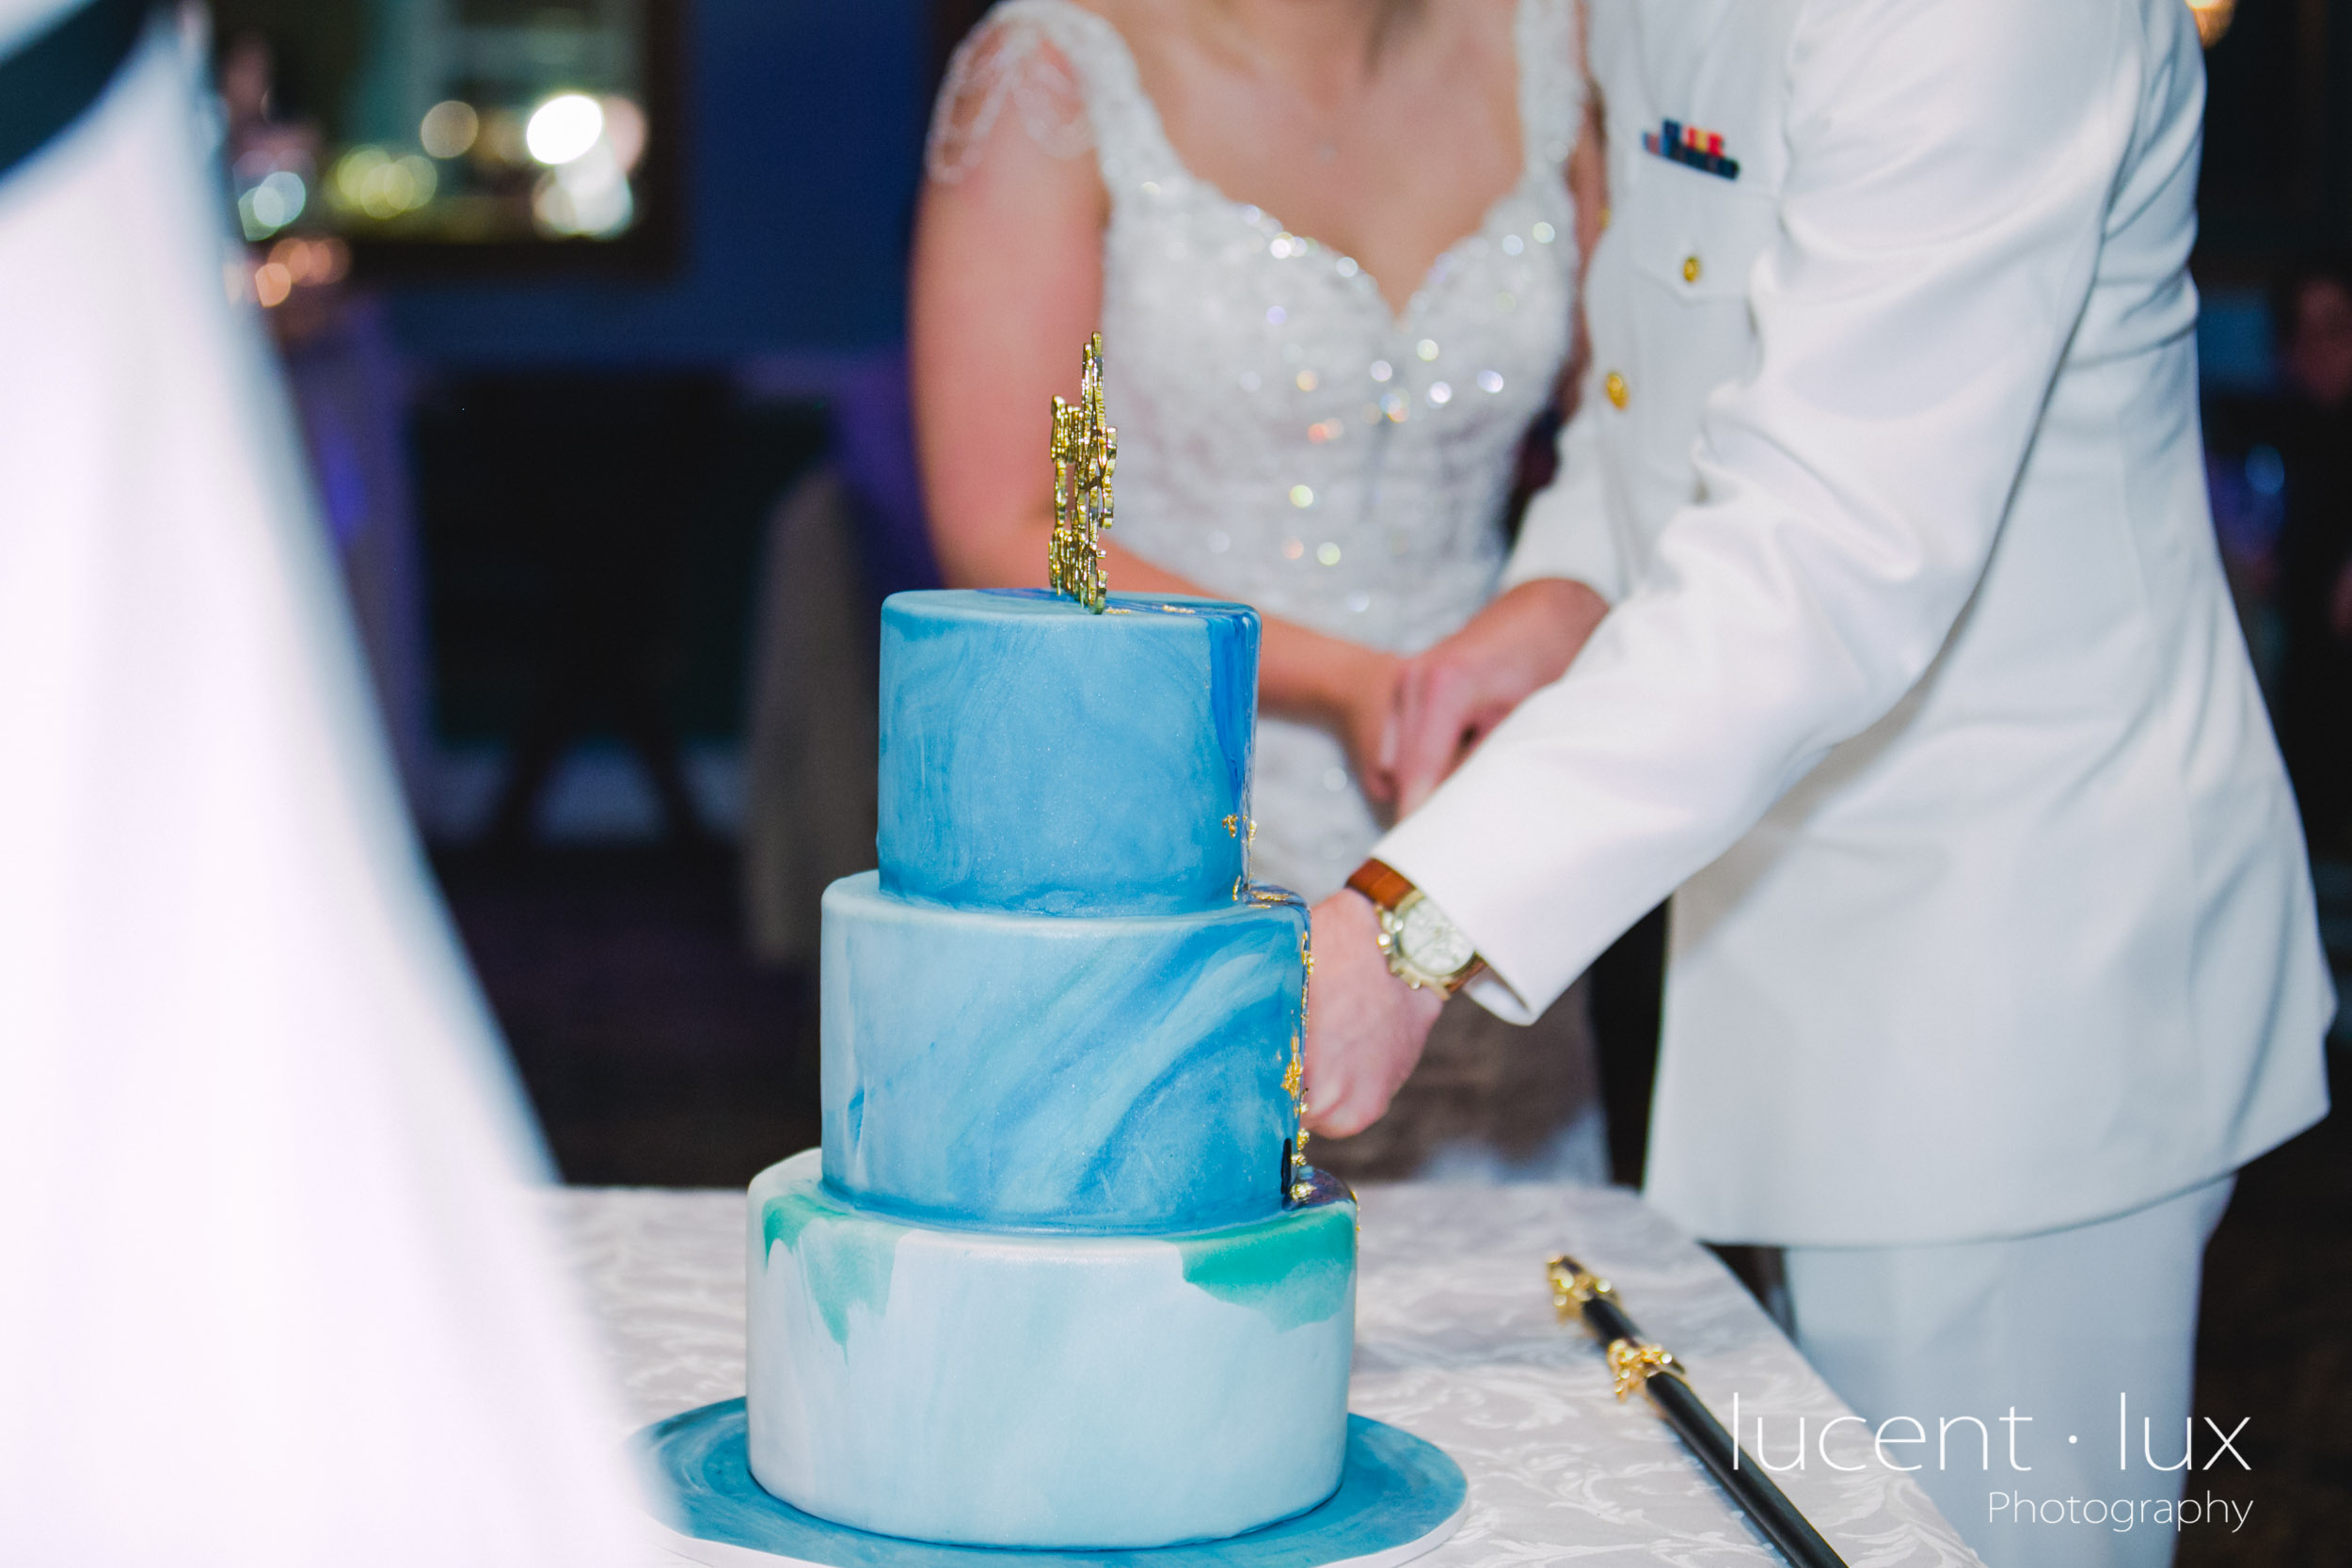 Wedding-Photography-Maryland-Pennsylvania-Photographer-Mendenhall-Inn-Media-Portrait-Event-160.jpg